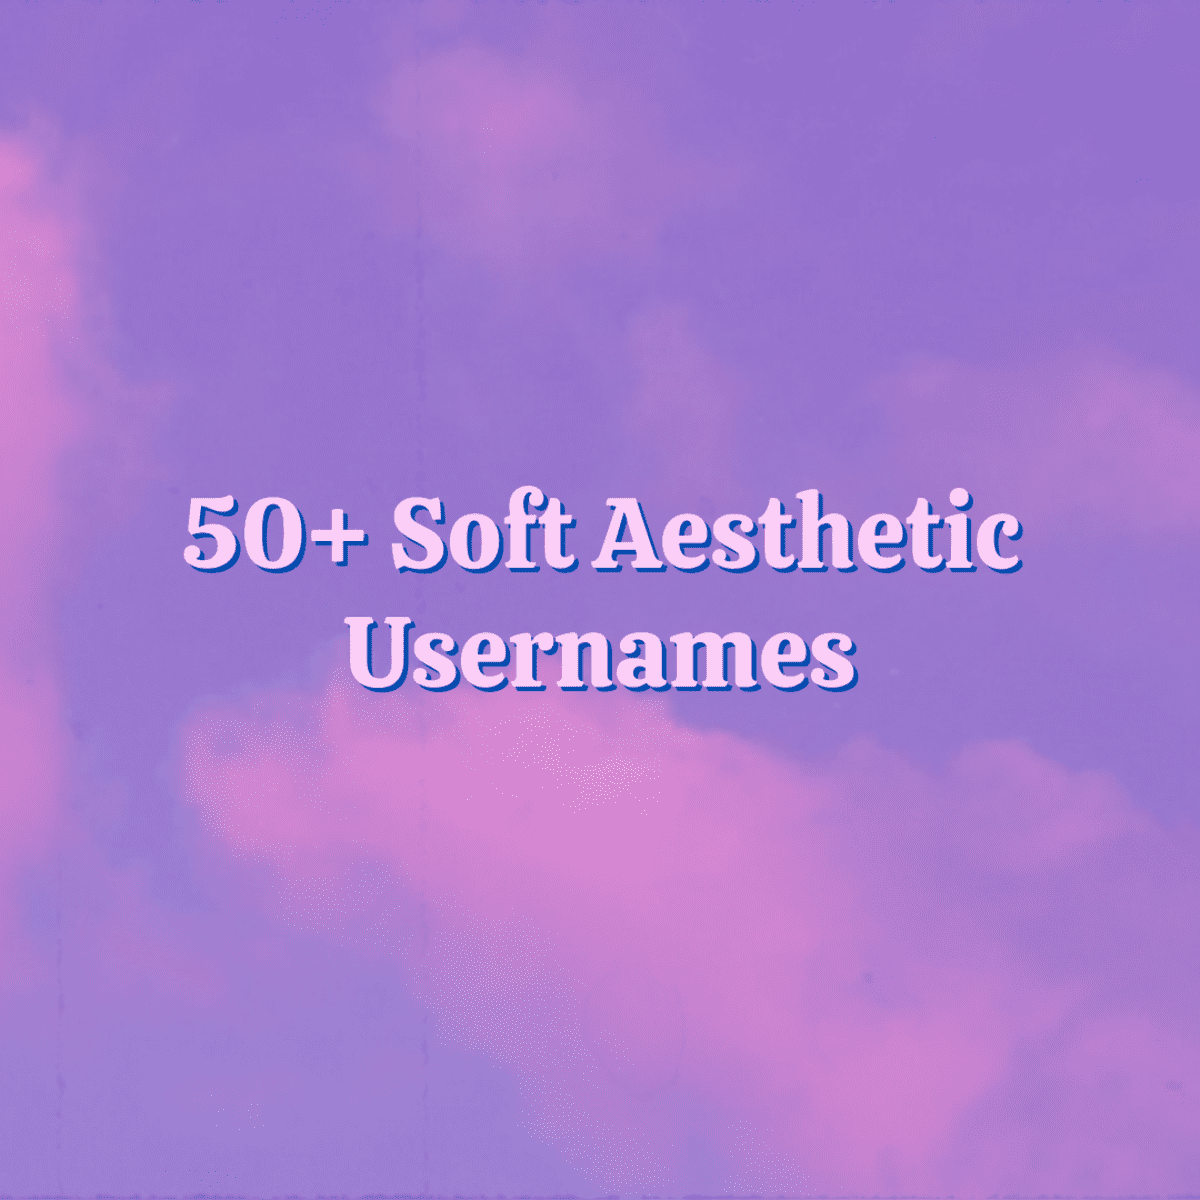 20+ Soft Aesthetic Usernames The Ultimate List   TurboFuture